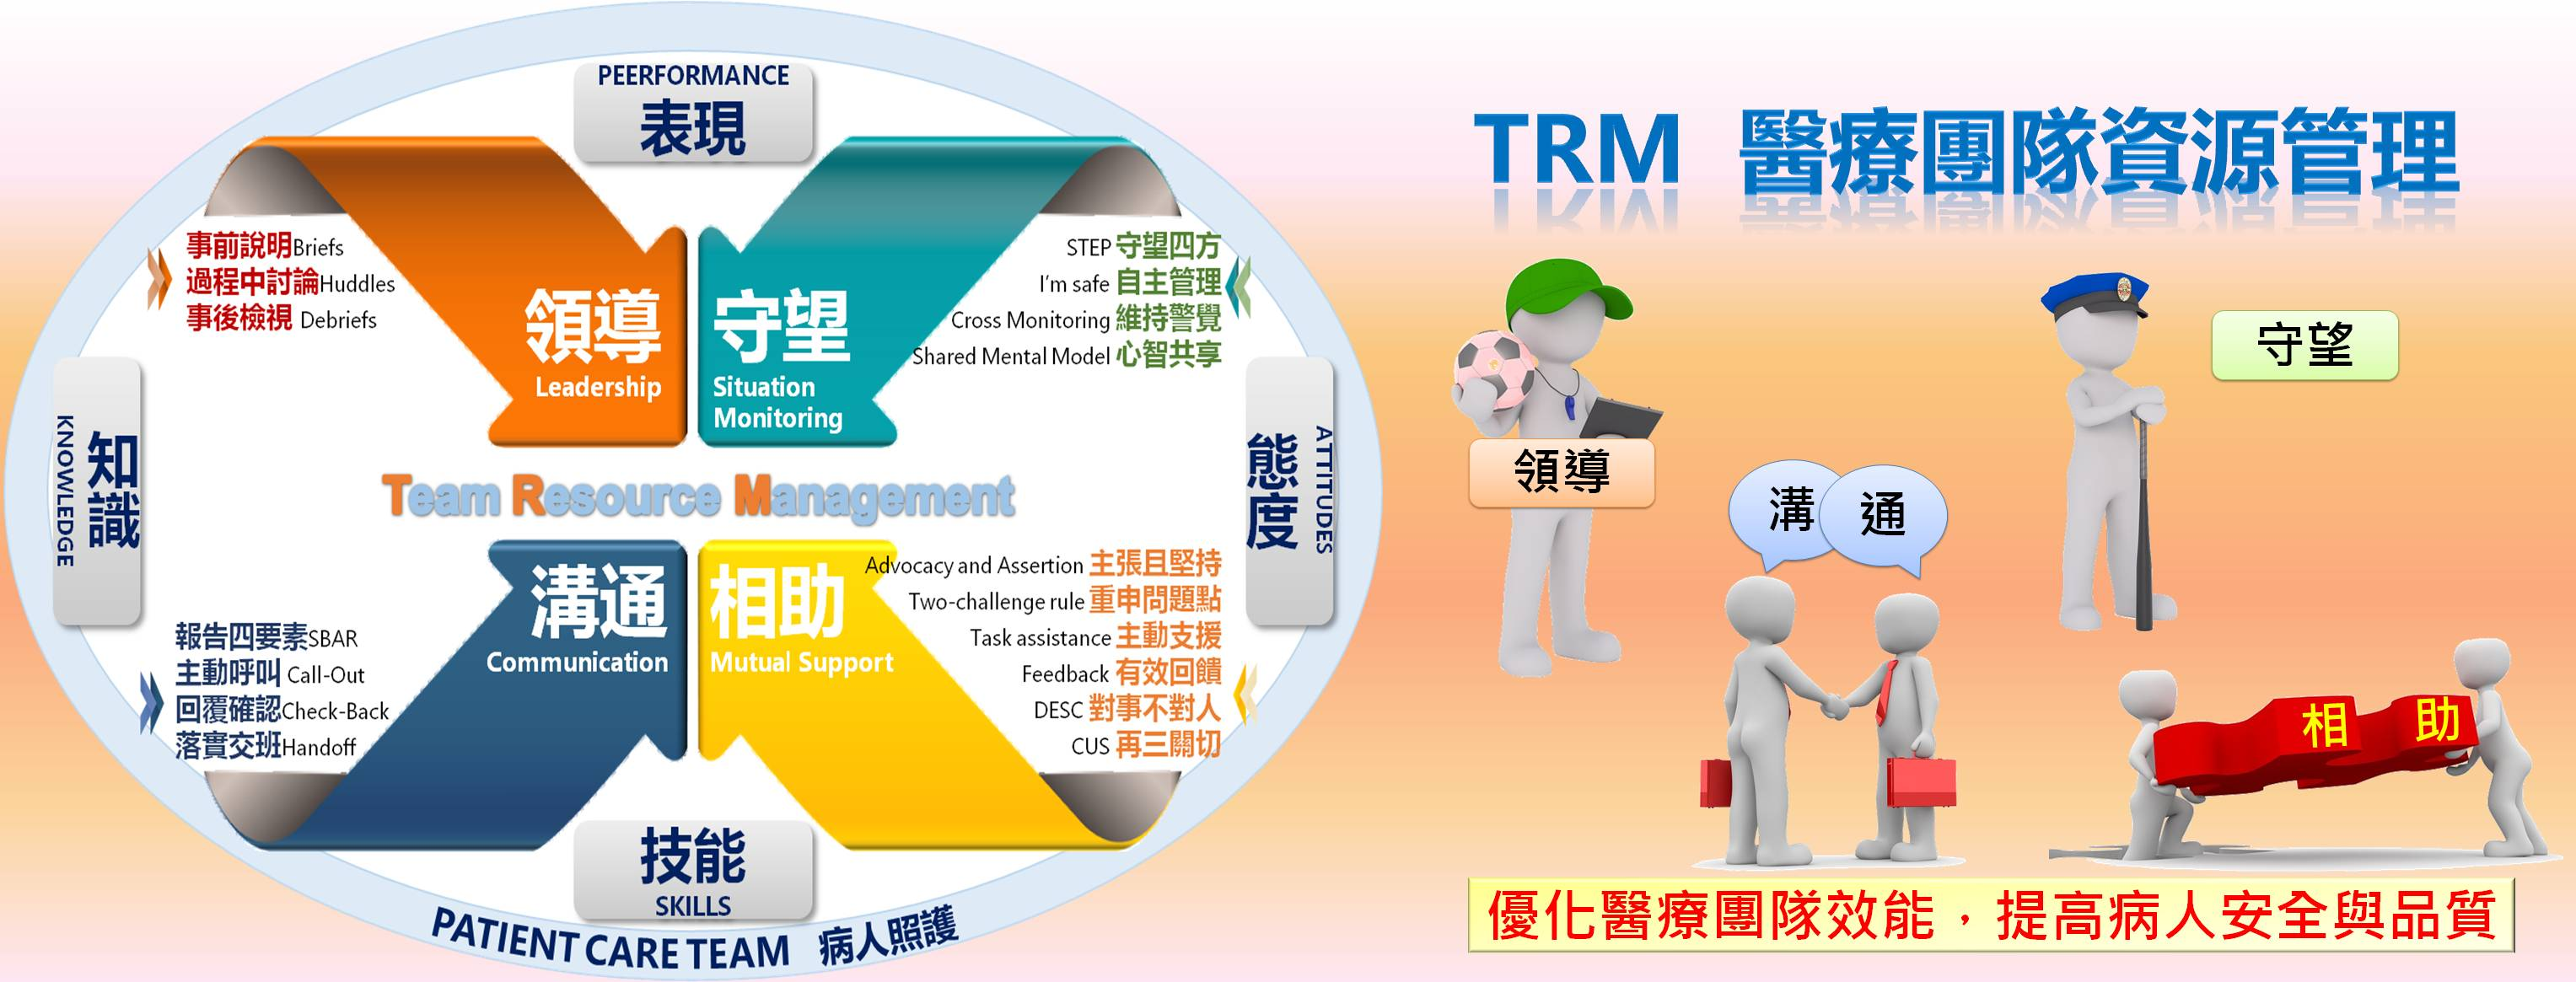 TRM四大工具模組(圖片)